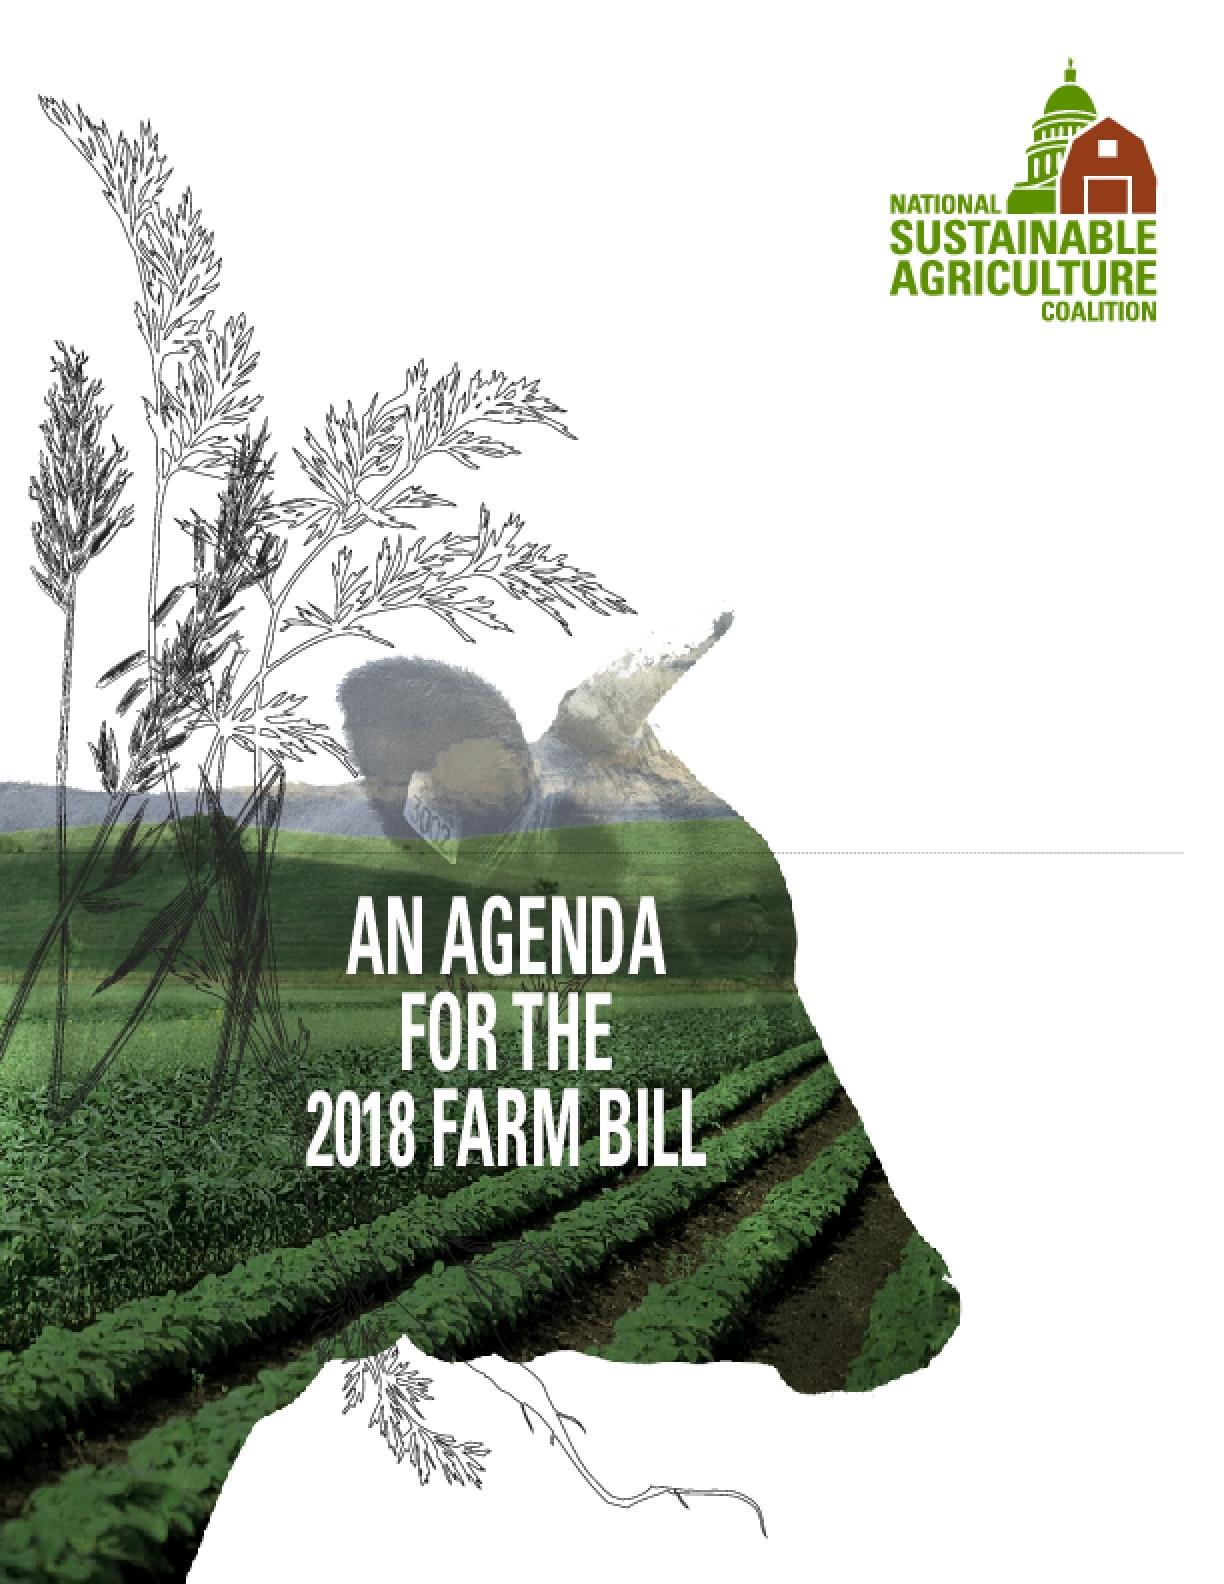 An Agenda for the 2018 Farm Bill